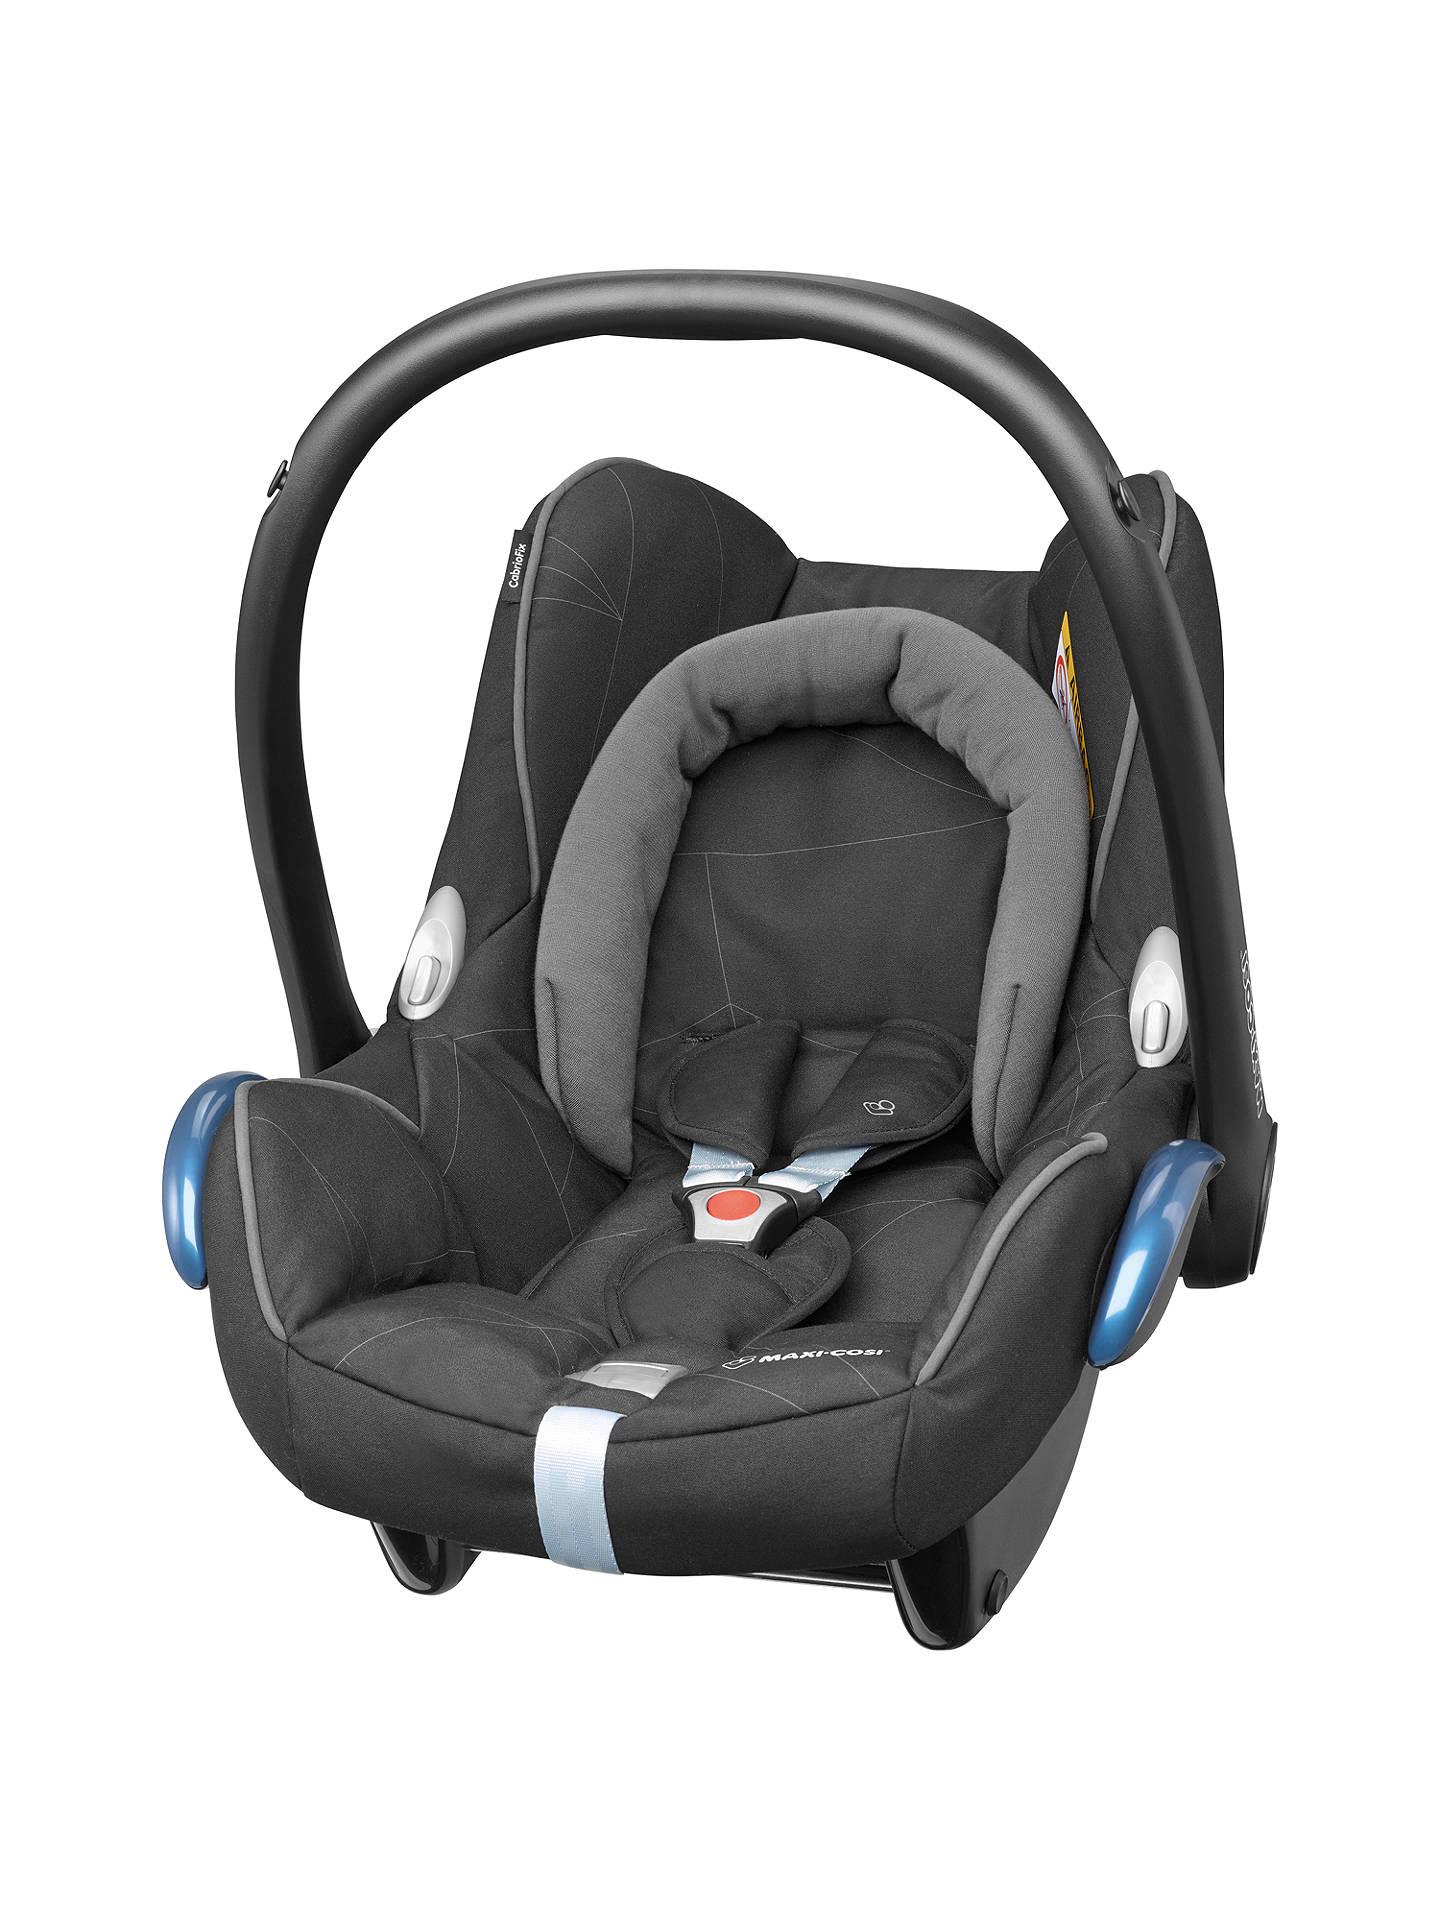 maxi cosi cabriofix group 0 baby car seat black diamond at john lewis partners. Black Bedroom Furniture Sets. Home Design Ideas